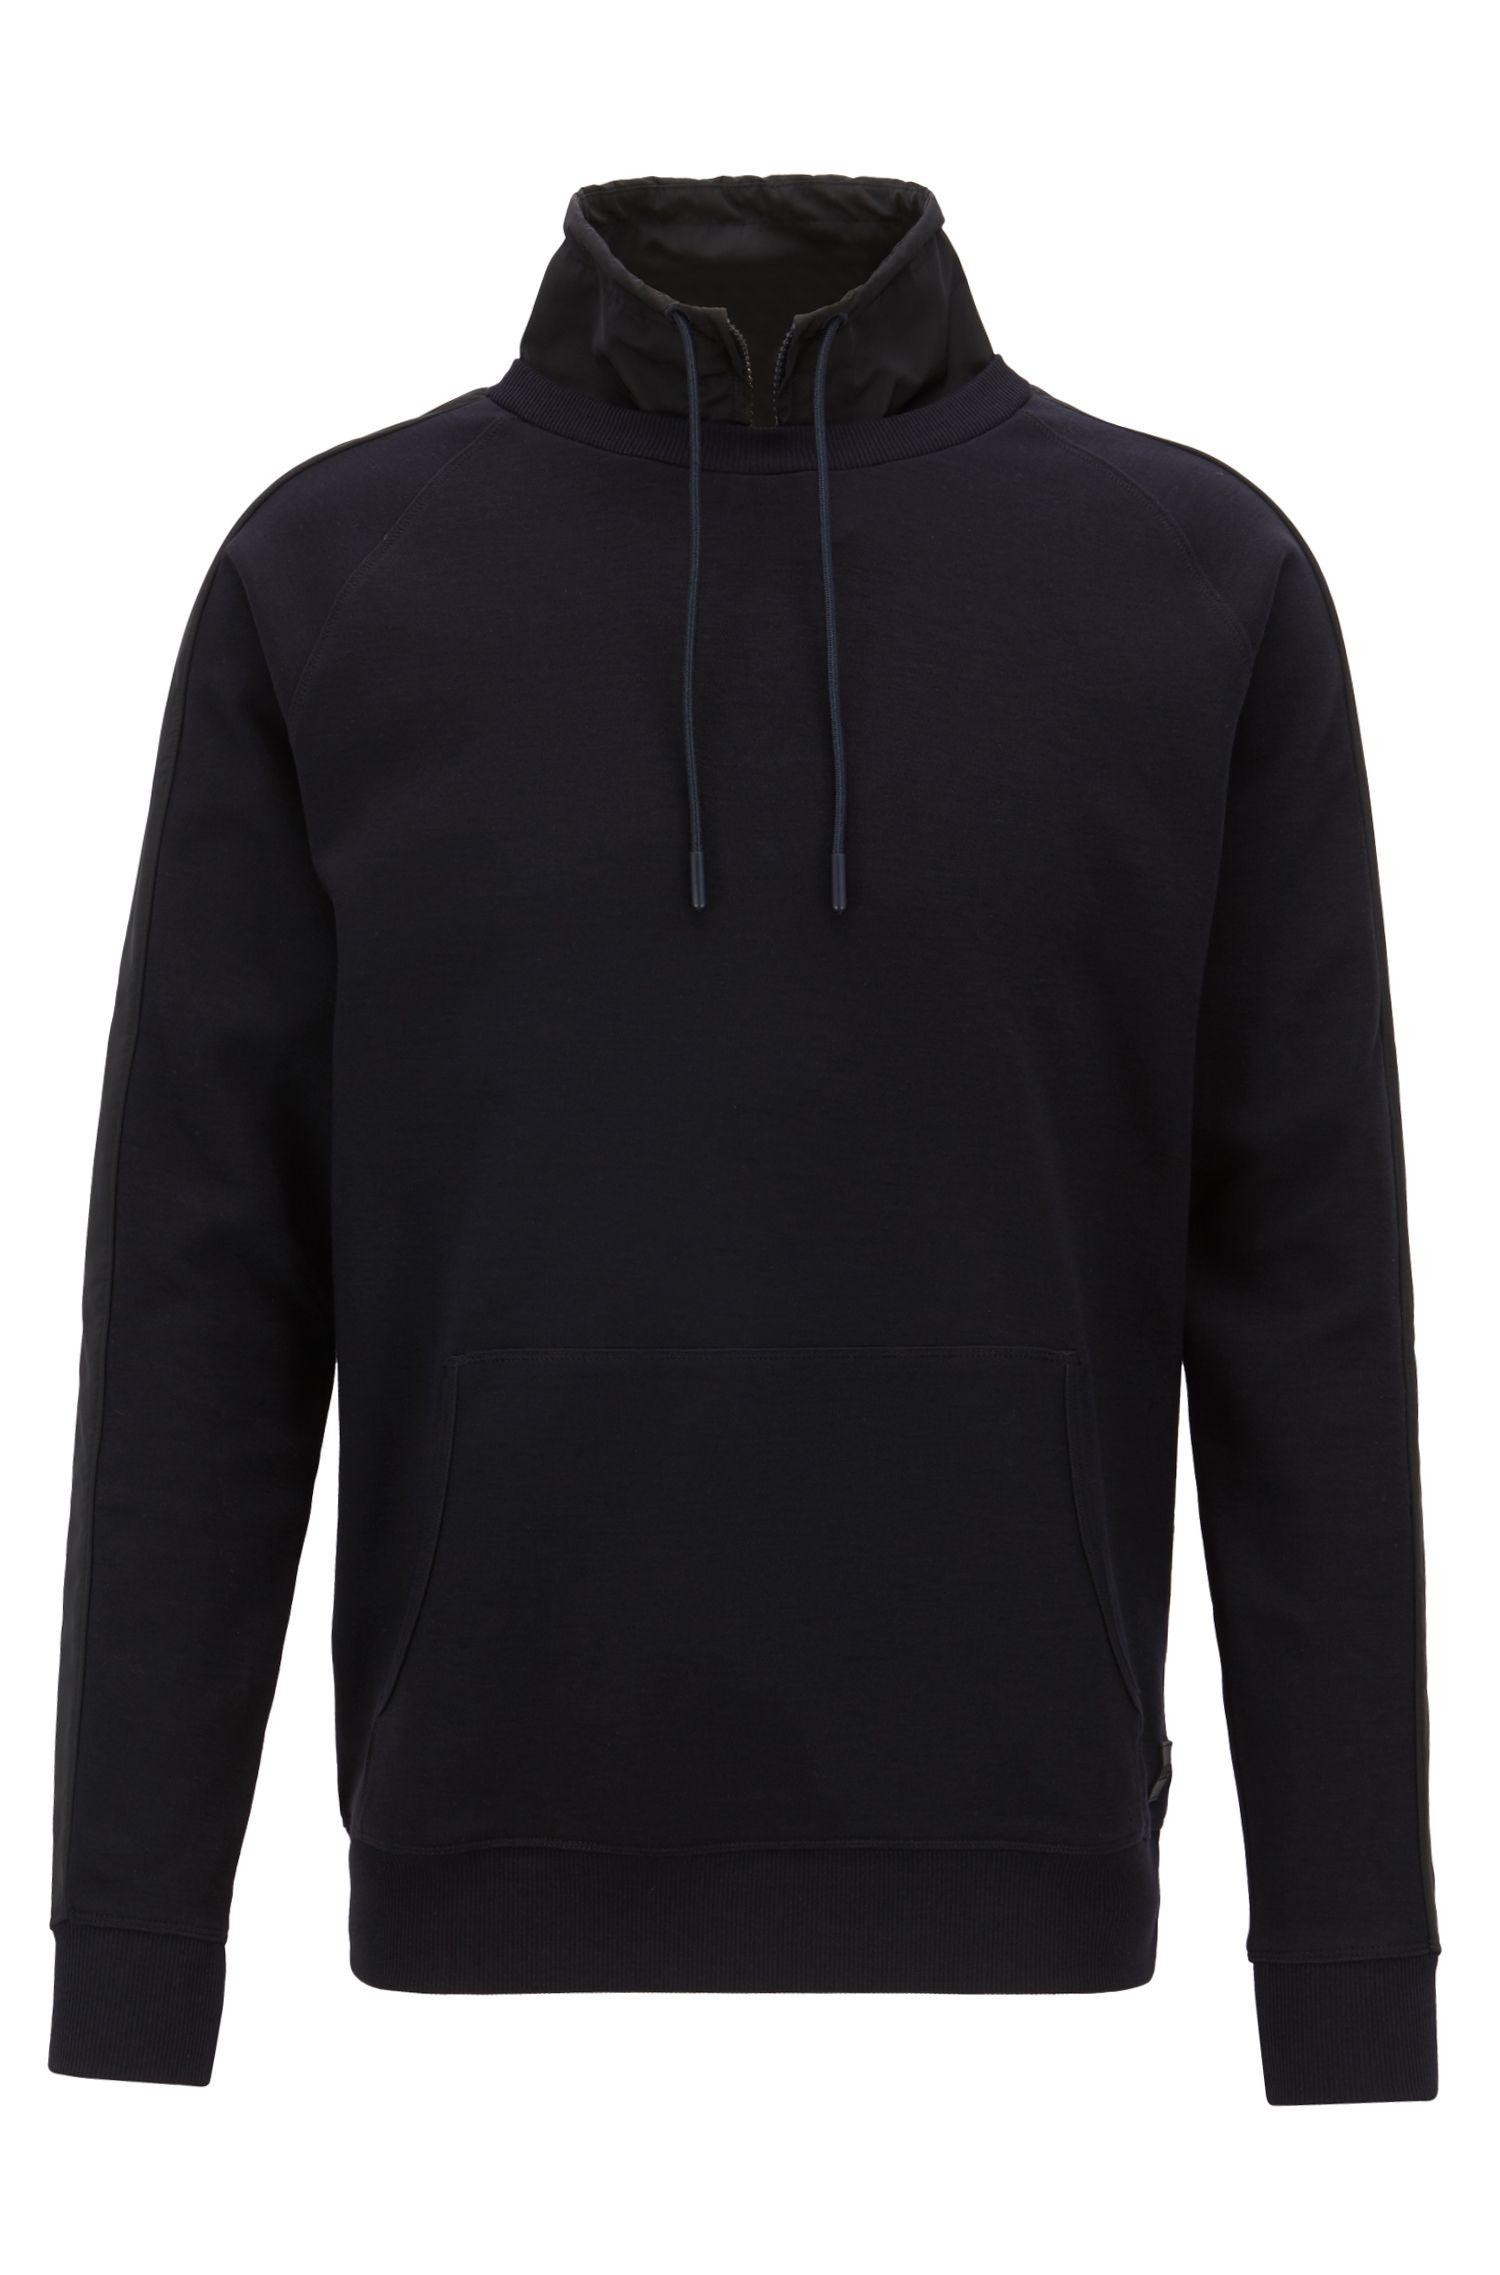 Waterafstotende sweater met afneembare, opstaande kraag, Donkerblauw